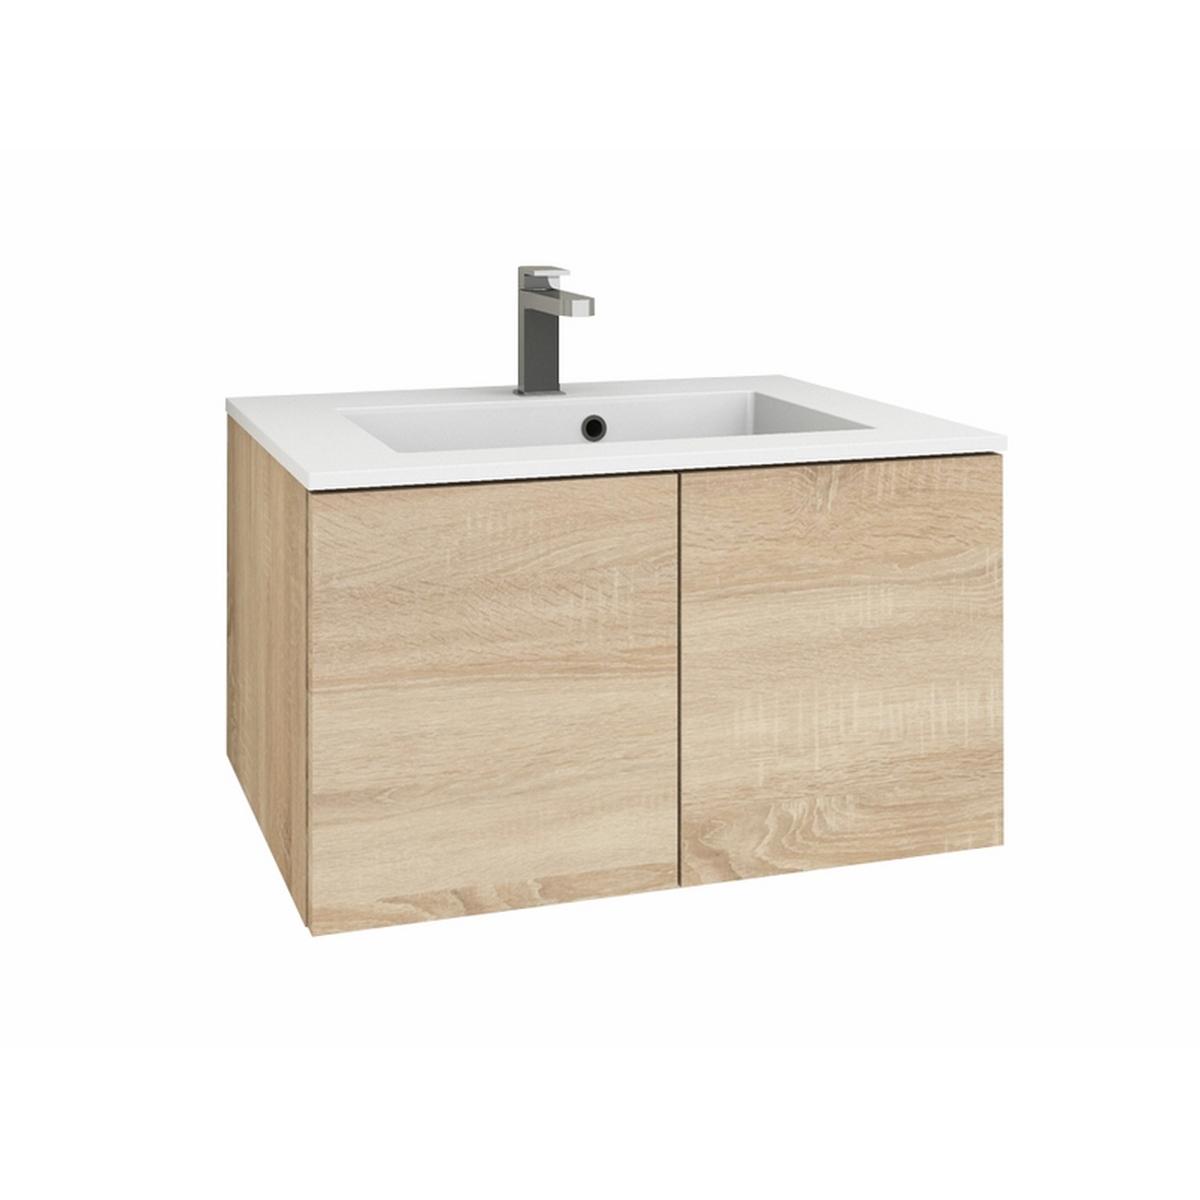 levanto 70 mineralguss waschtisch set mit 2 t ren. Black Bedroom Furniture Sets. Home Design Ideas